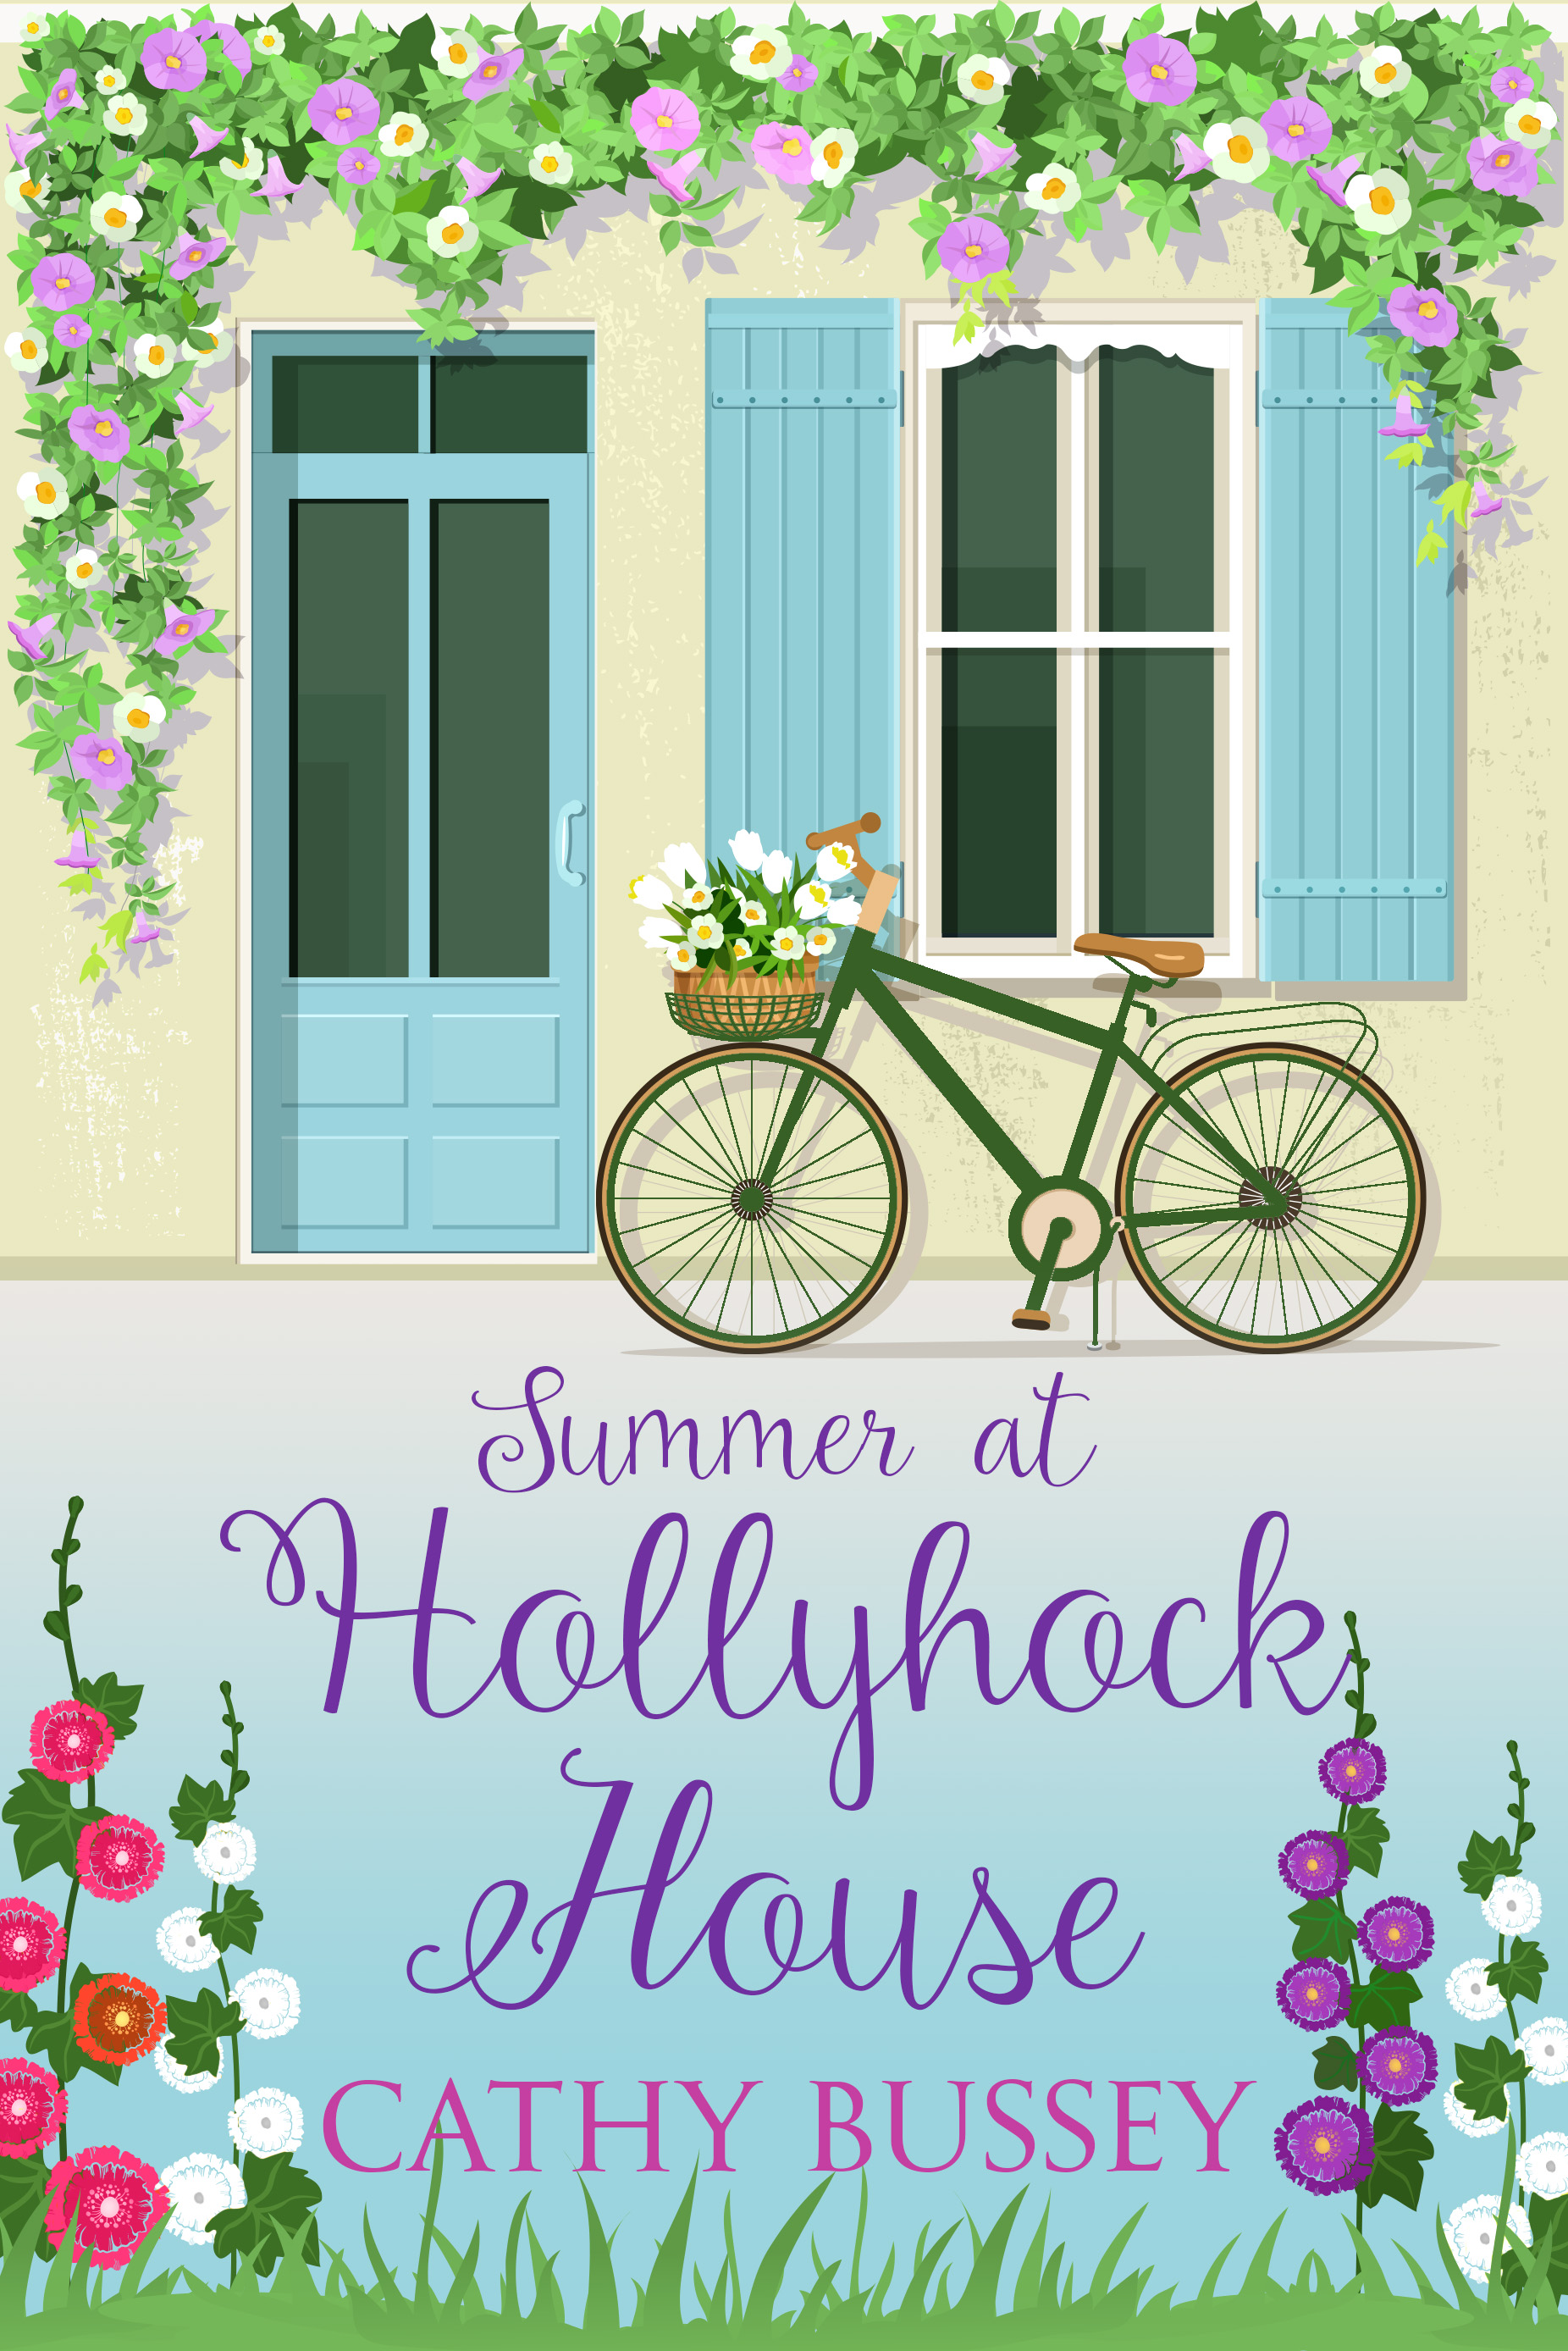 Summer at Hollyhock House-3.jpg